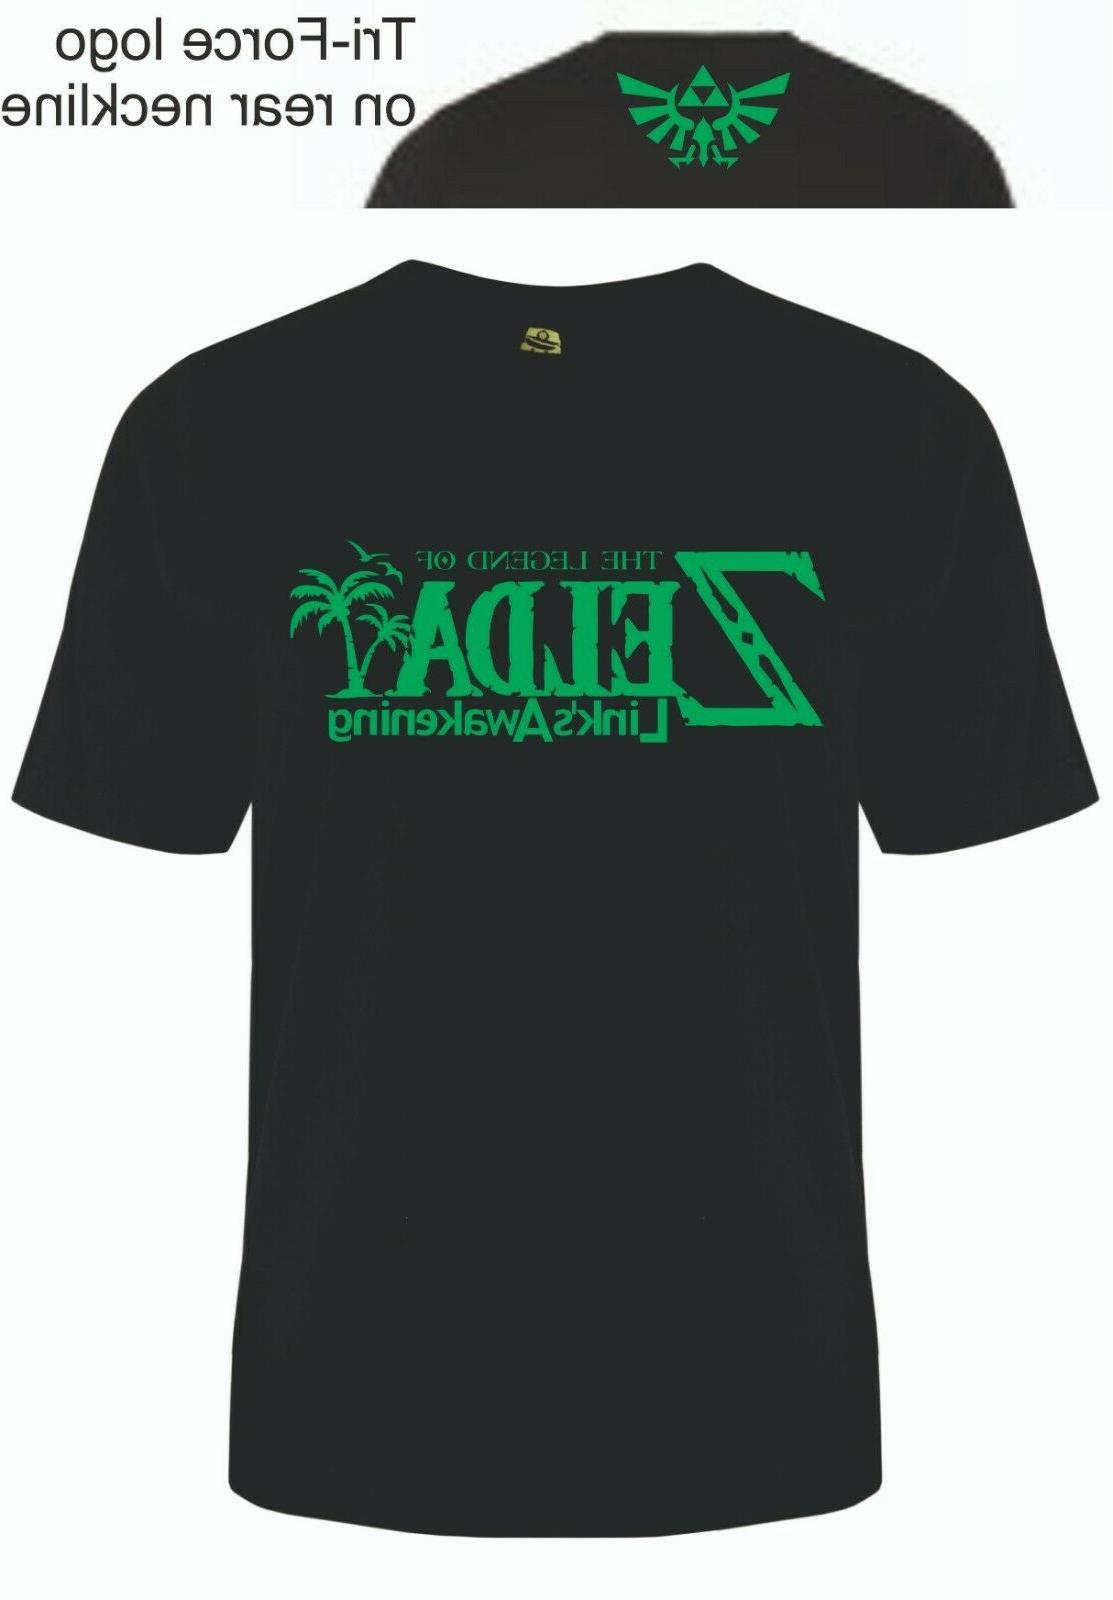 zelda link s awakening t shirt switch